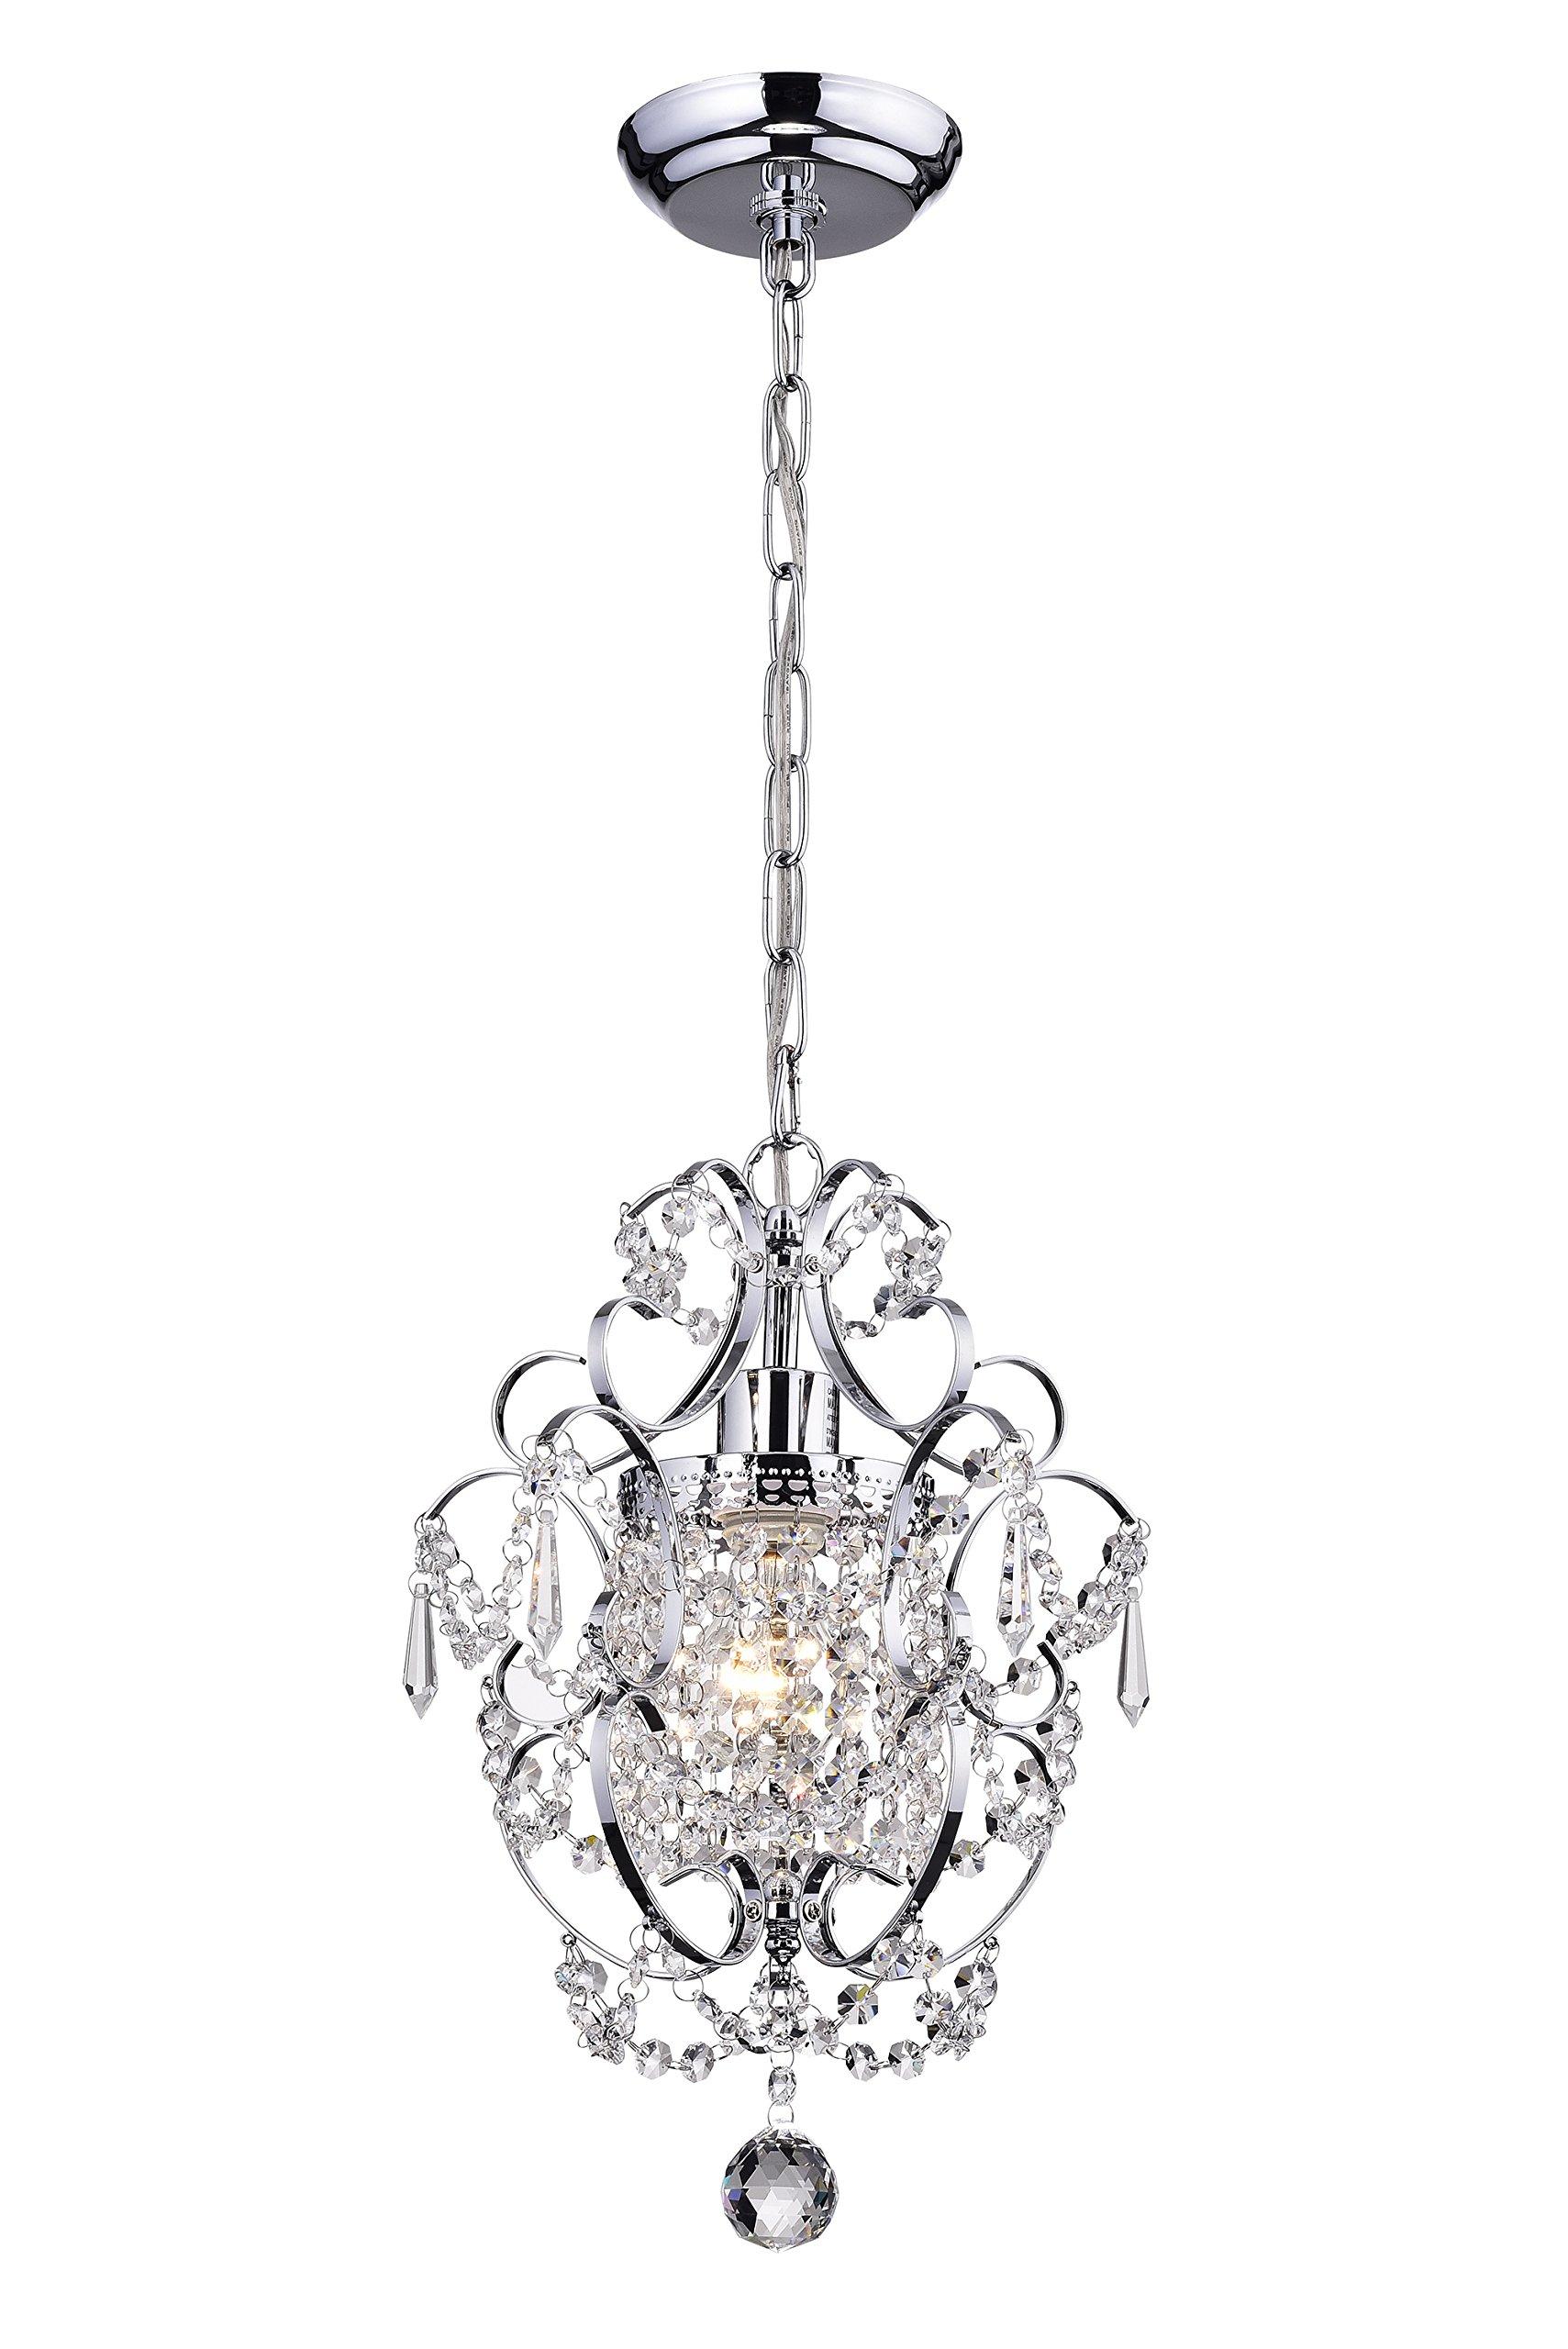 Edvivi Amorette 1-Light Chrome Finish Mini Pendant Chandelier Wrought Iron Ceiling Light Fixture | Glam Lighting by Edvivi (Image #2)